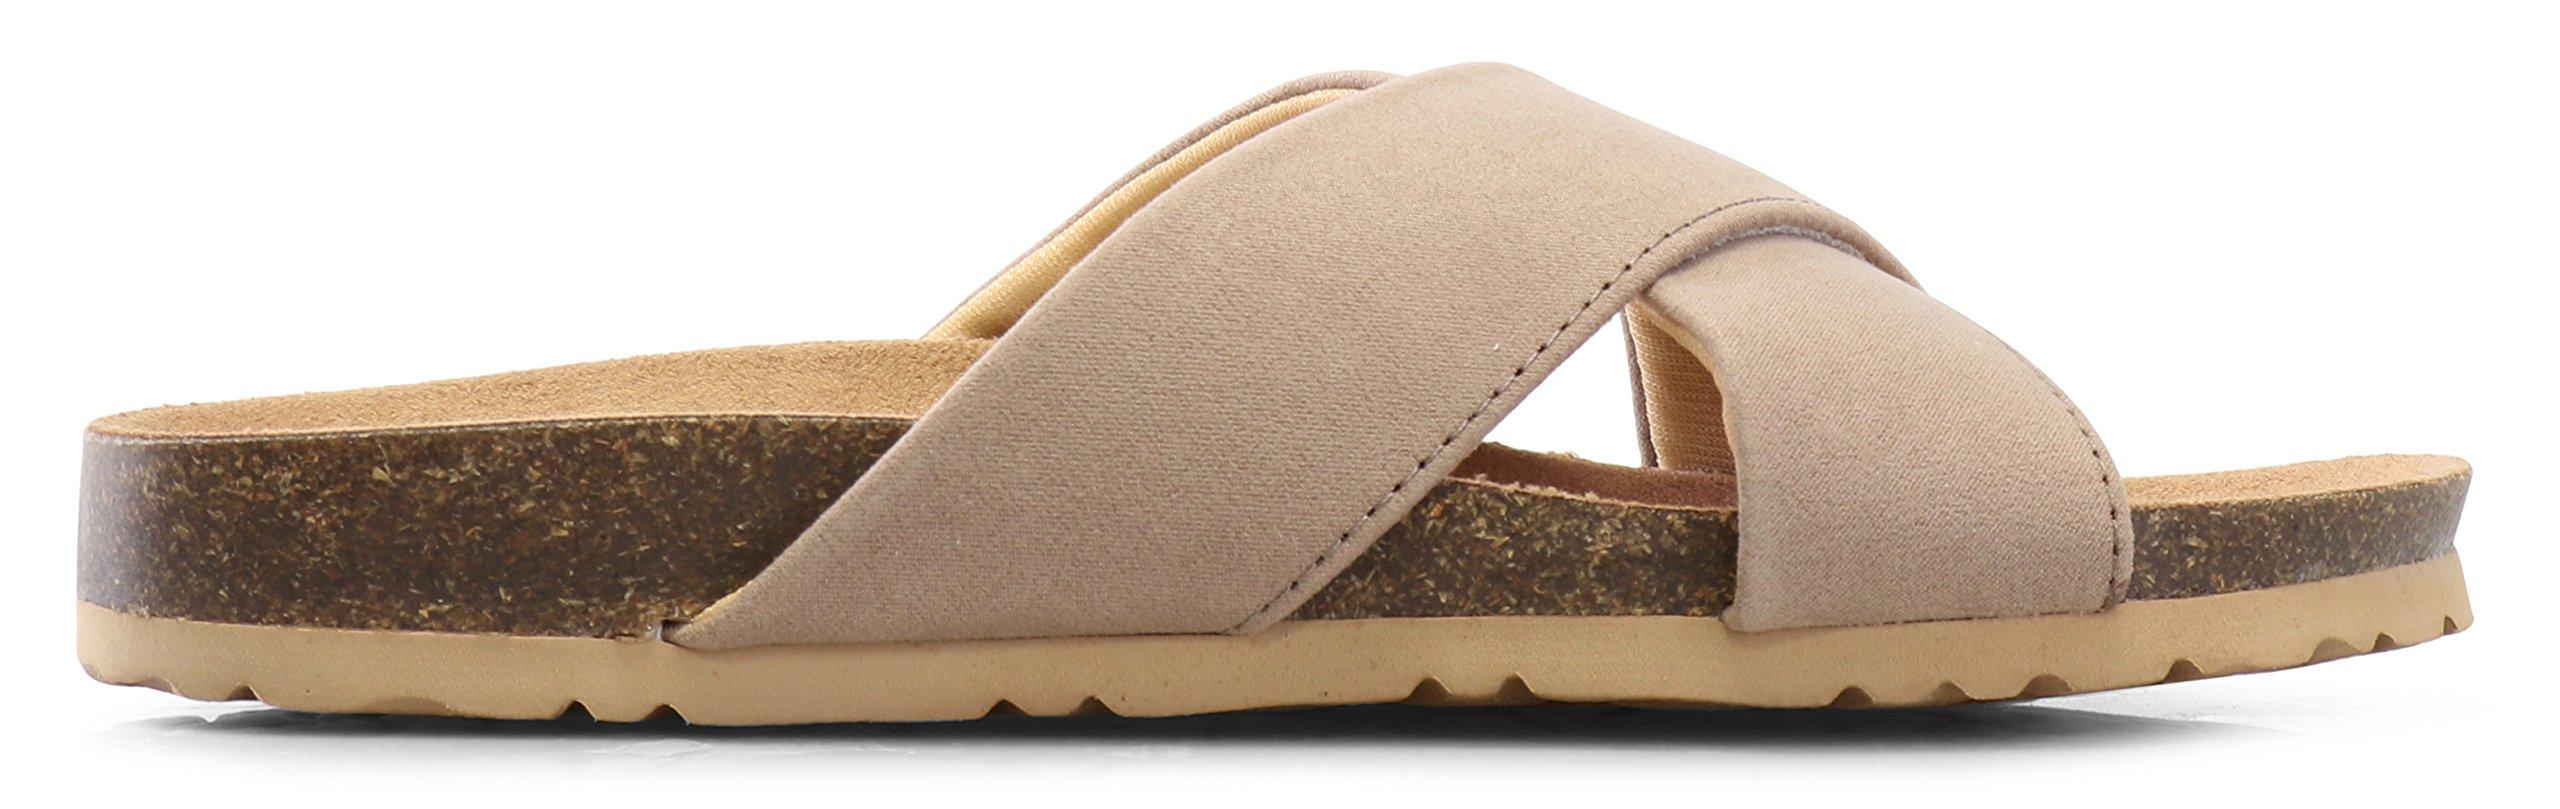 LUSTHAVE Women's Slip on Slide Sandals - Low Cork Bottom - Comfort Platform Flats - Open Toe Light Taupe 9